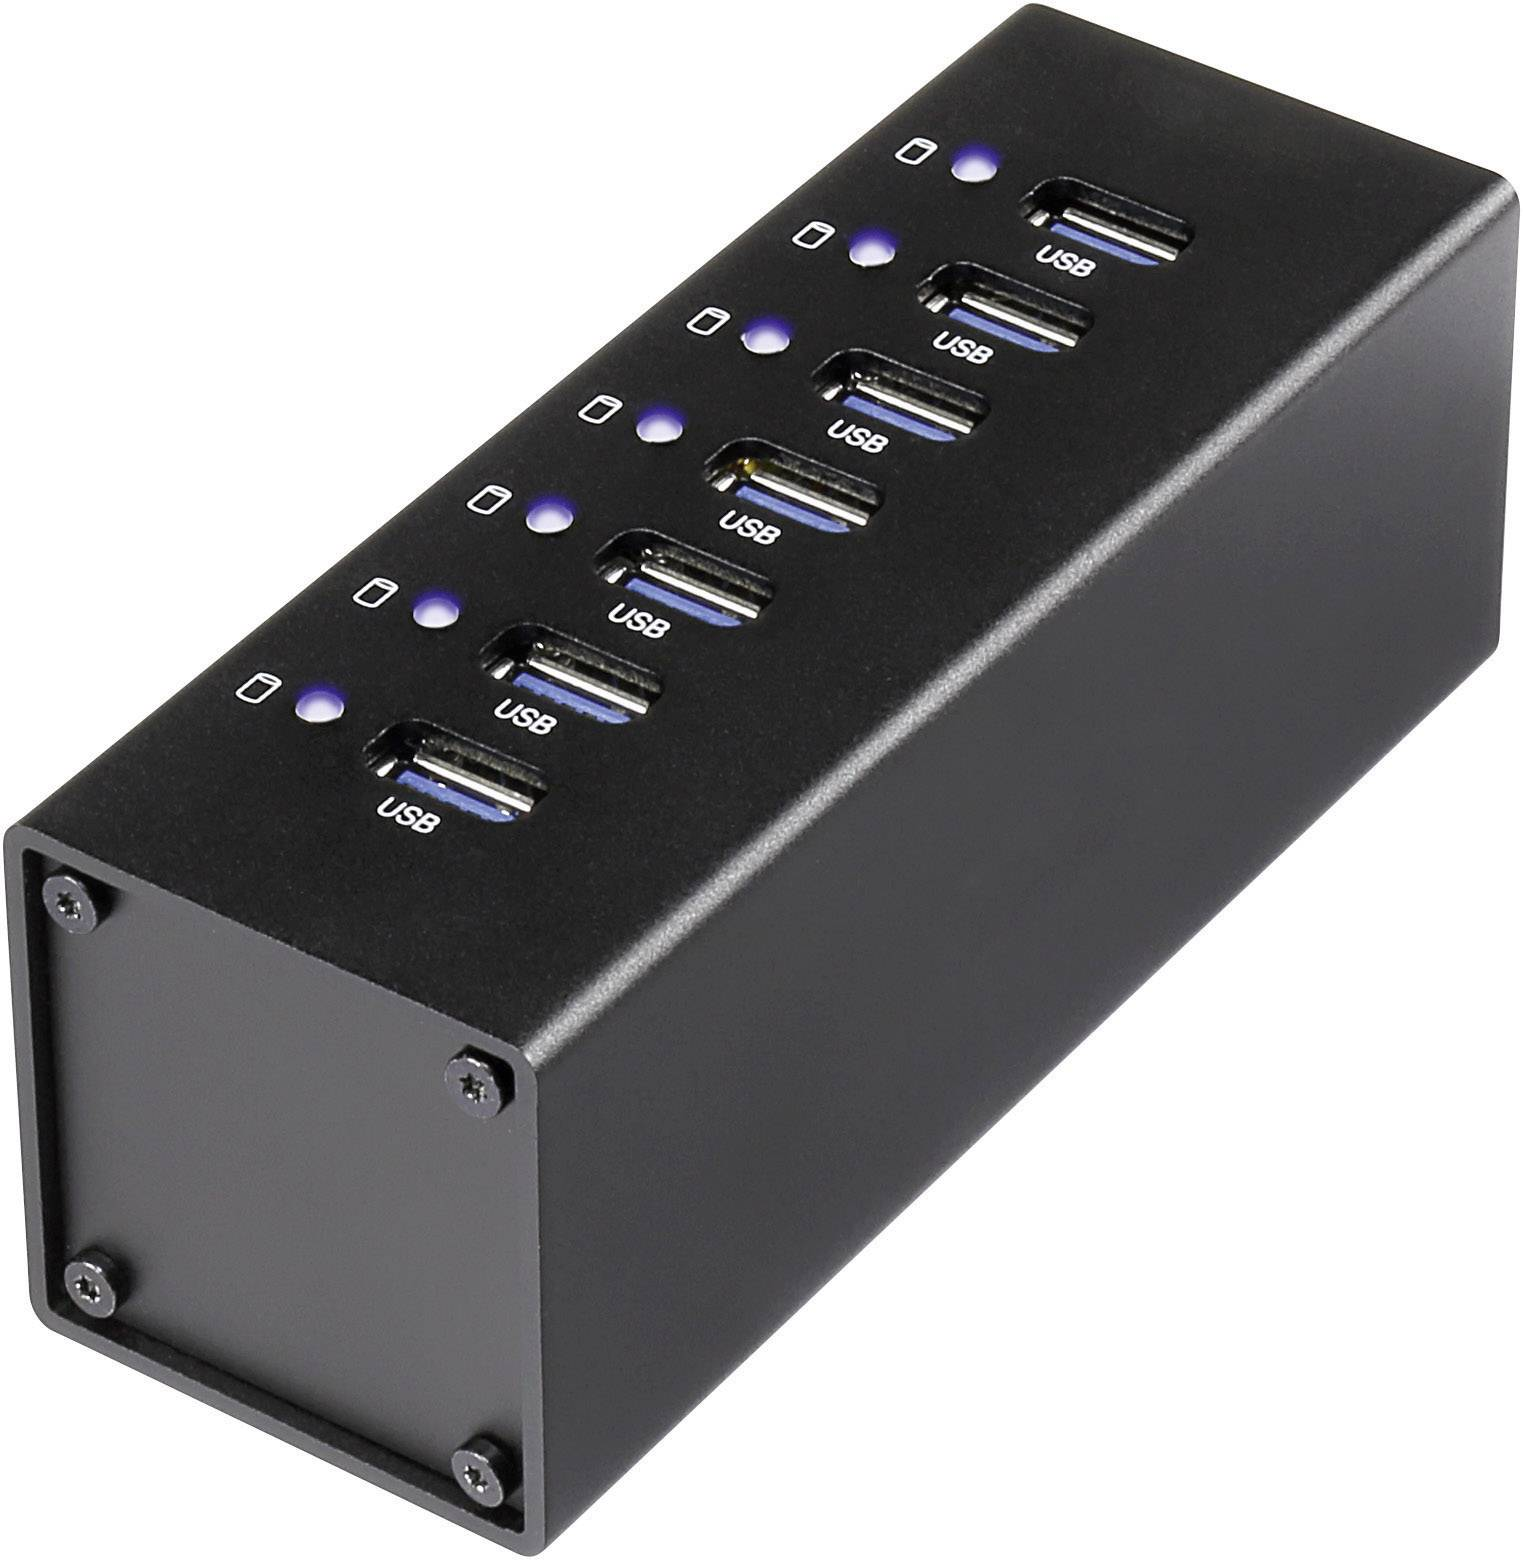 USB 3.0 hub 629548 7 portov, 50 mm, čierna